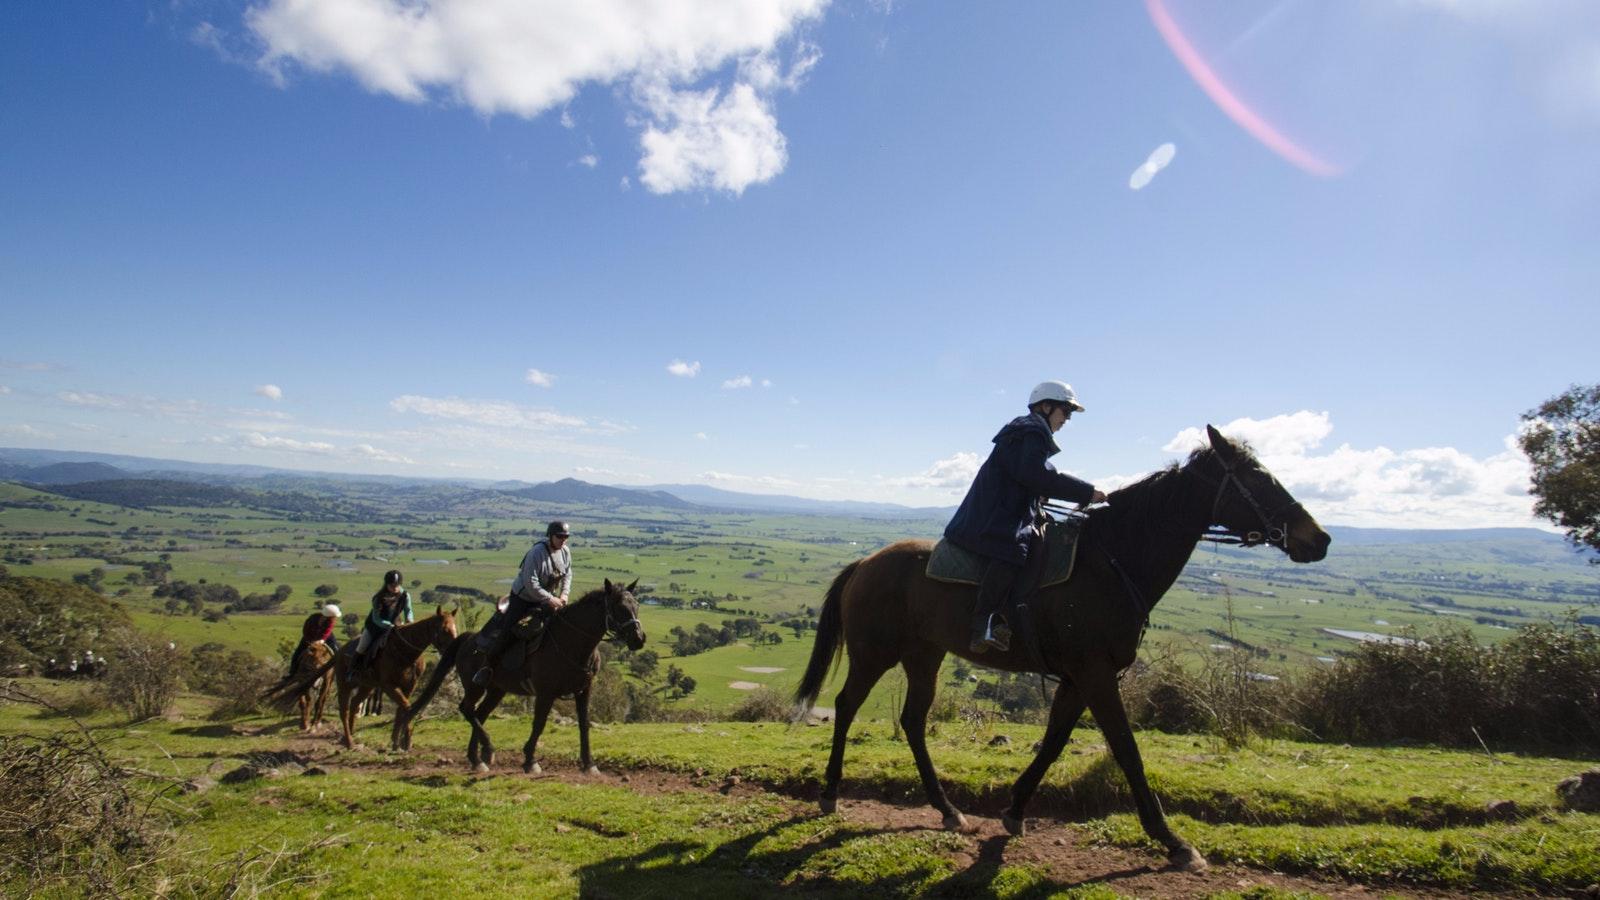 Spectacular scenery on horseback